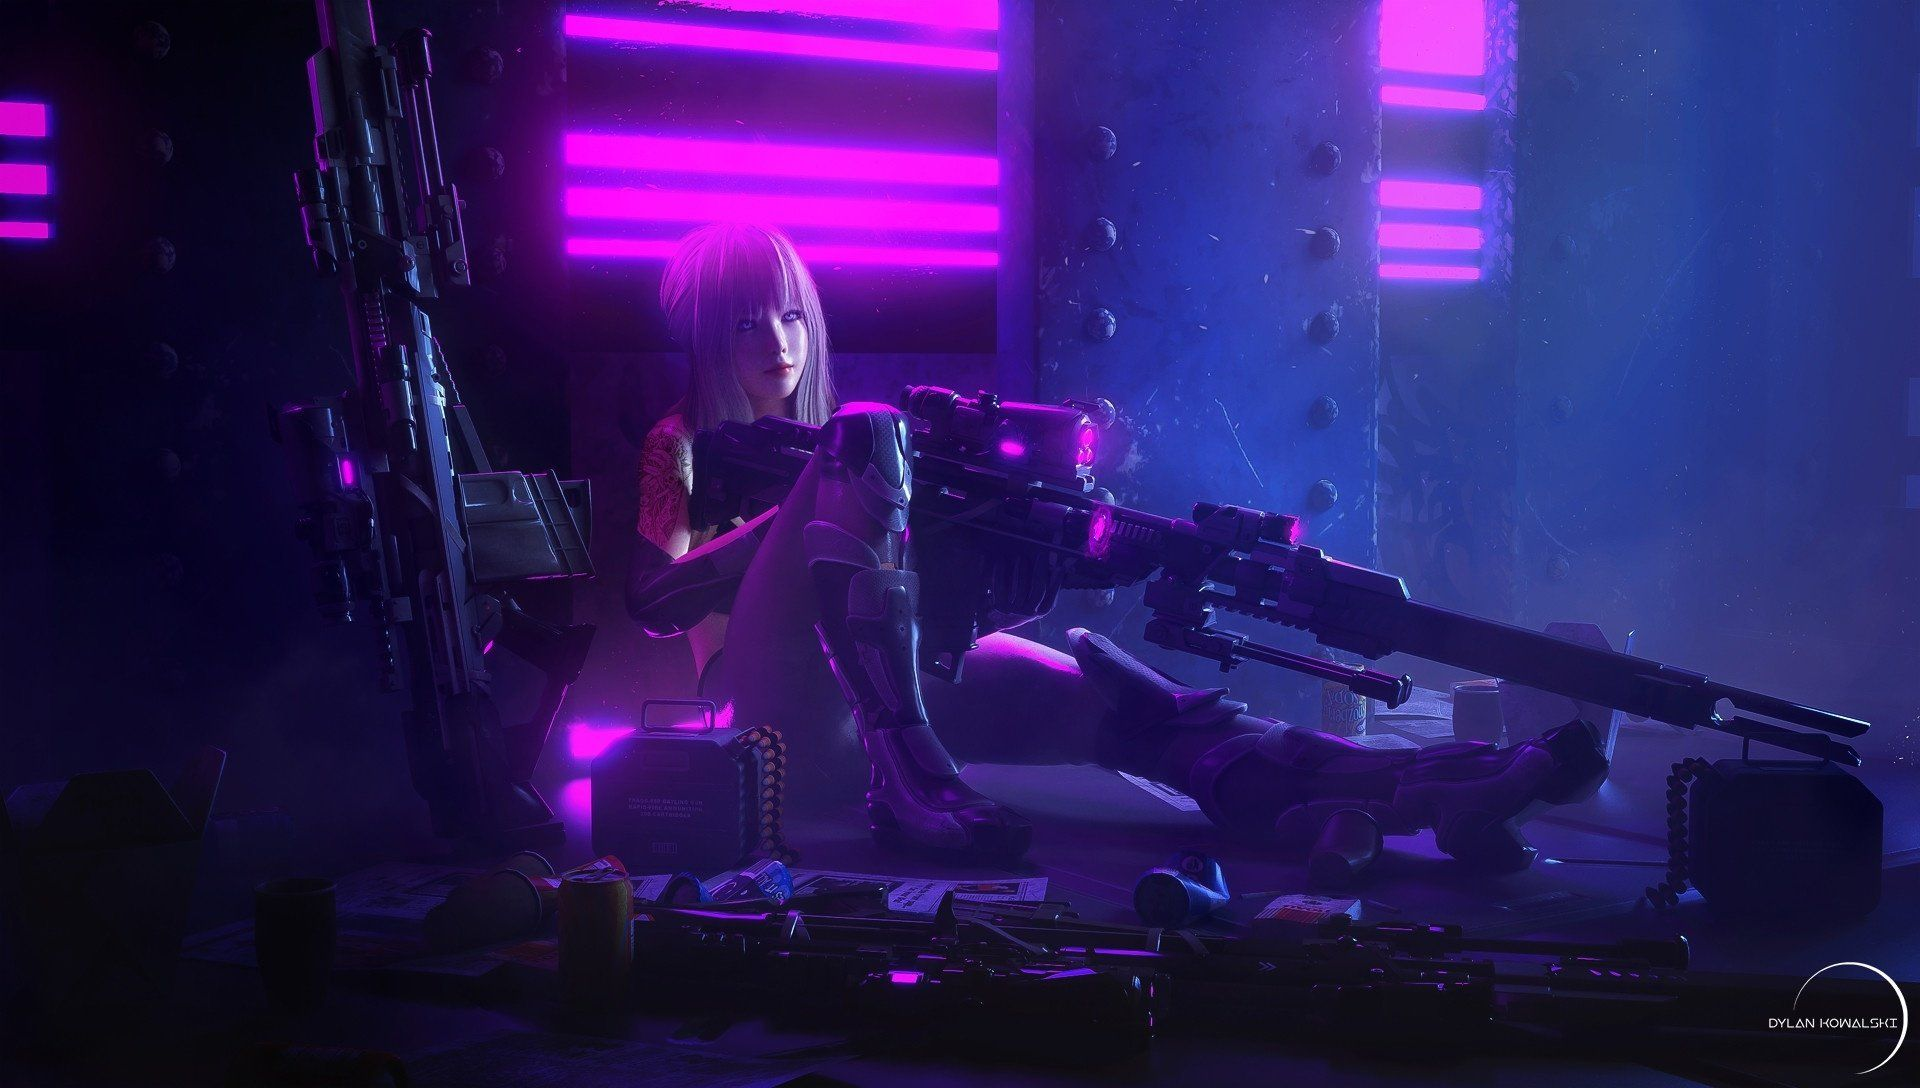 Pin on /G/ Cyberpunk